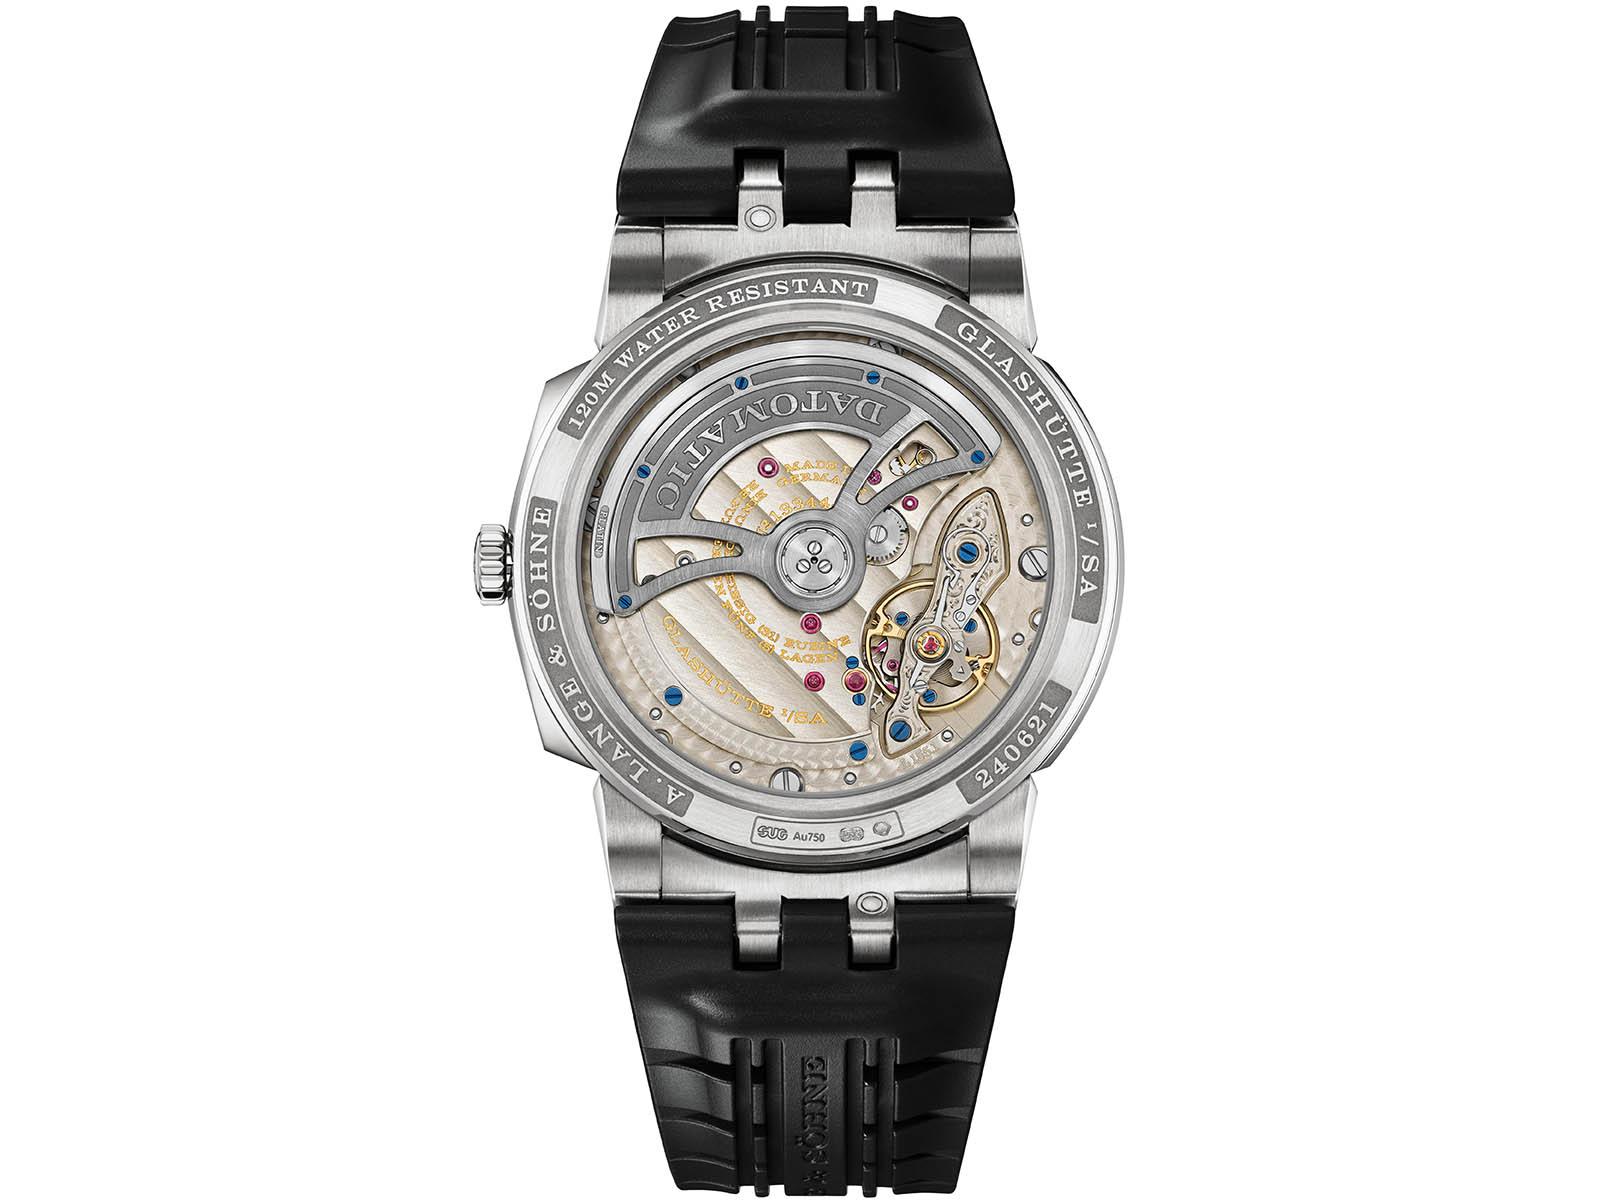 363-068-a-lange-sohne-odysseus-watch-wonders-2020-2.jpg